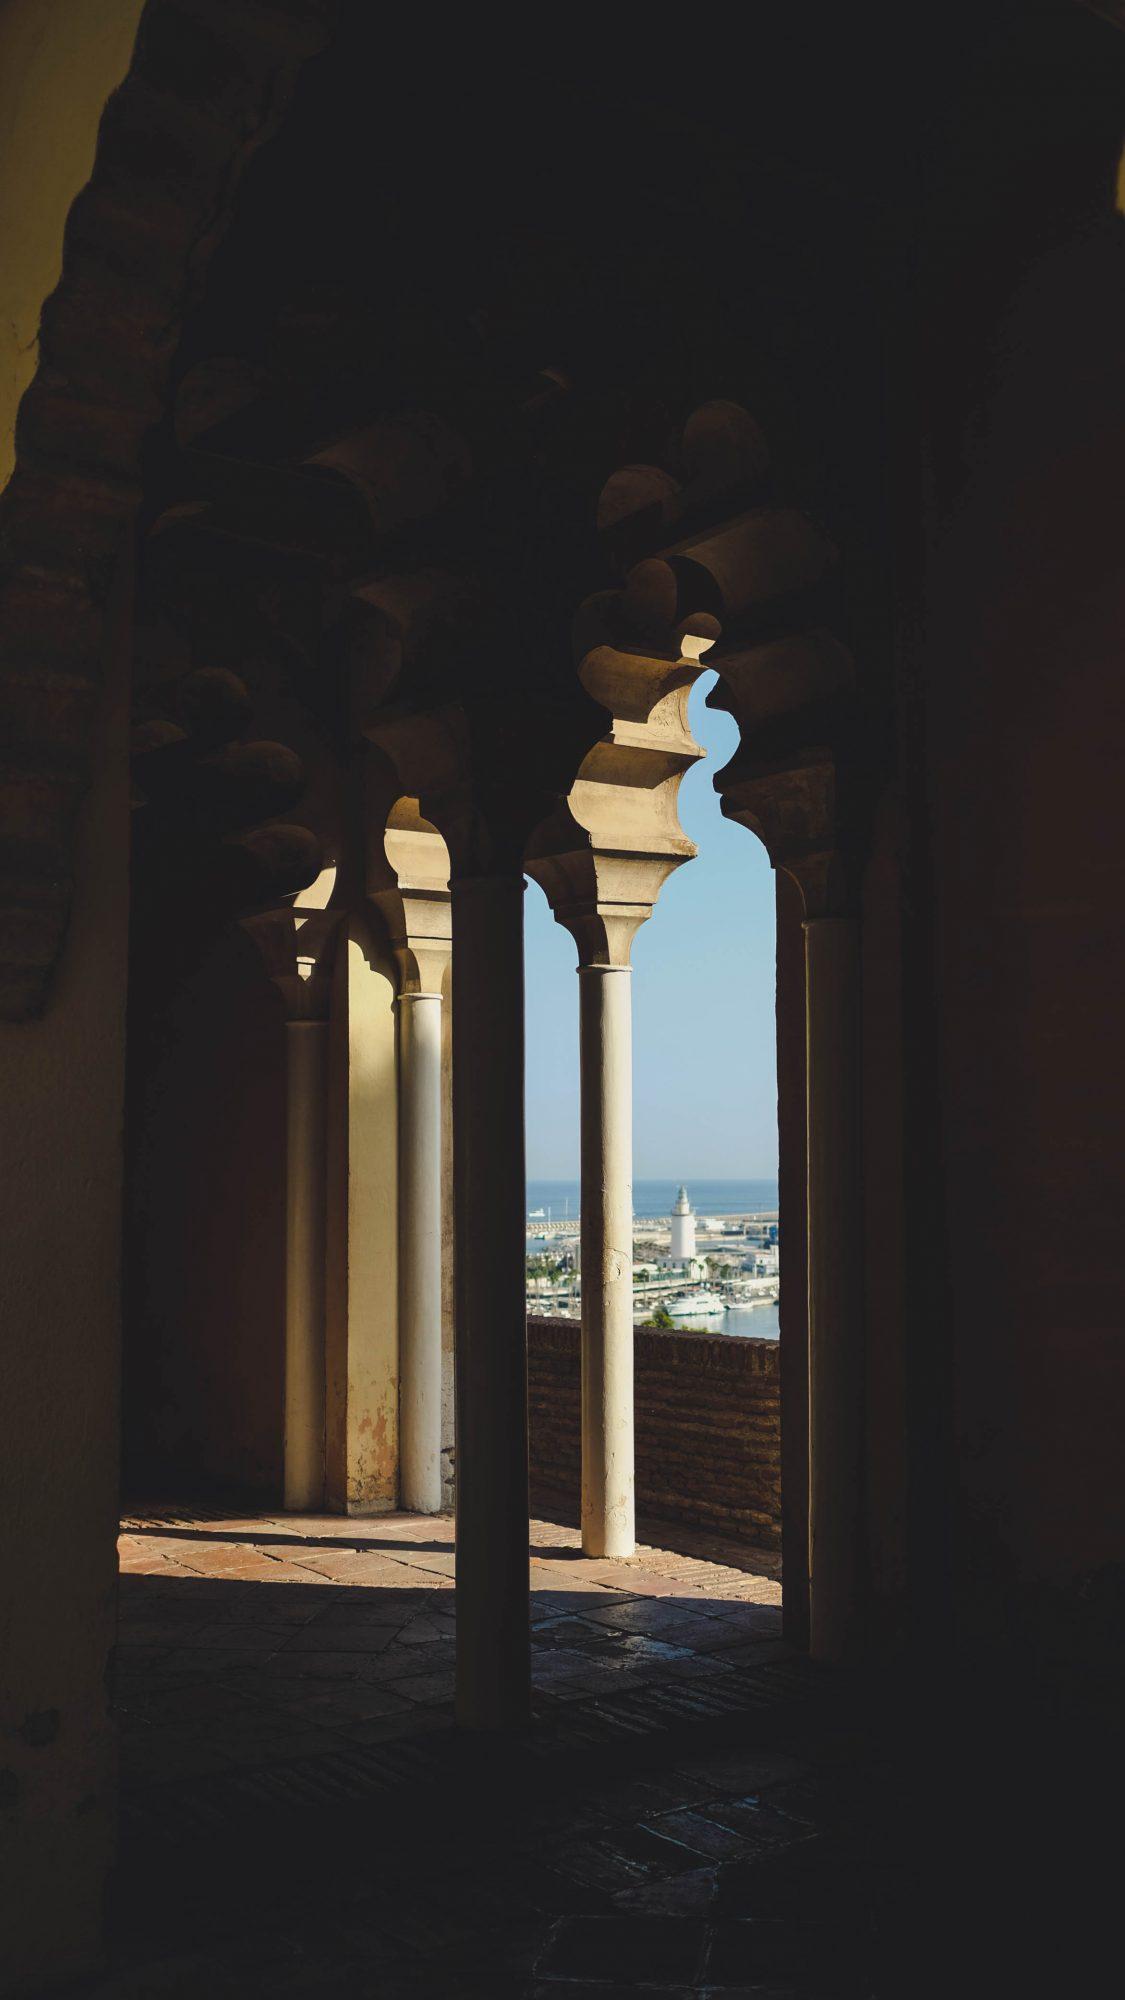 L'Alcazaba de Malaga - Malaga, Espagne